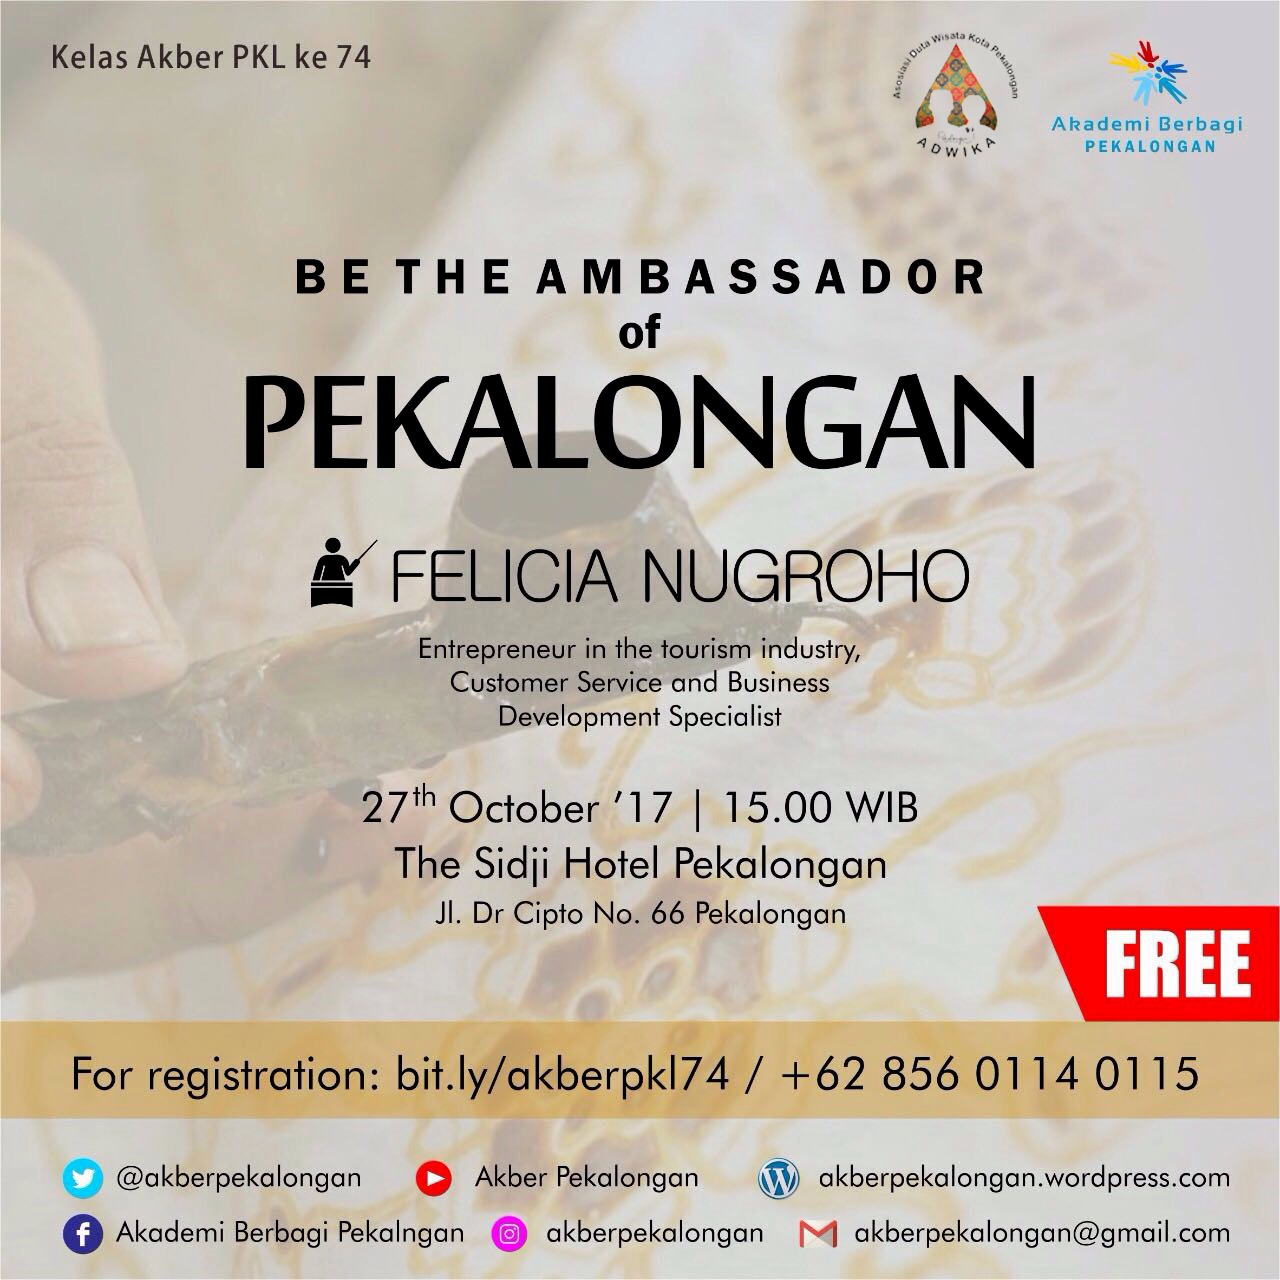 Pekalongan: Be The Ambassador of Pekalongan